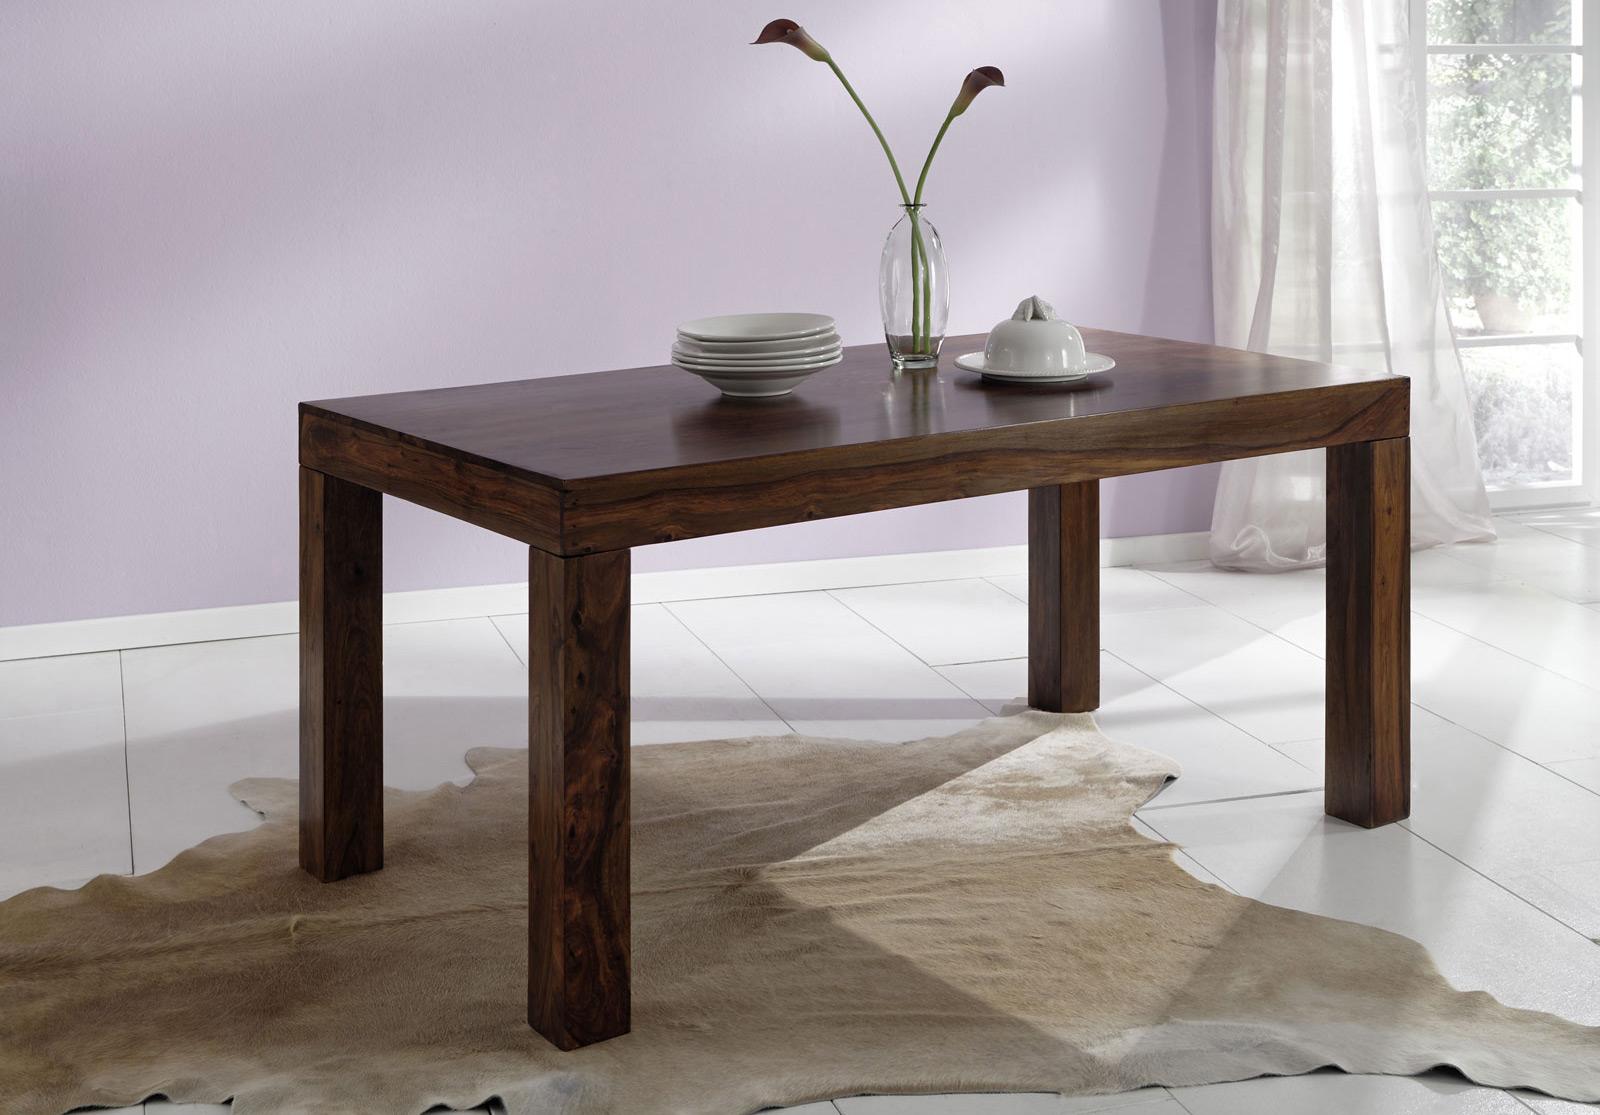 sam esstisch massivholz 200 x 100 cm sheesham walnussfarben cubus. Black Bedroom Furniture Sets. Home Design Ideas